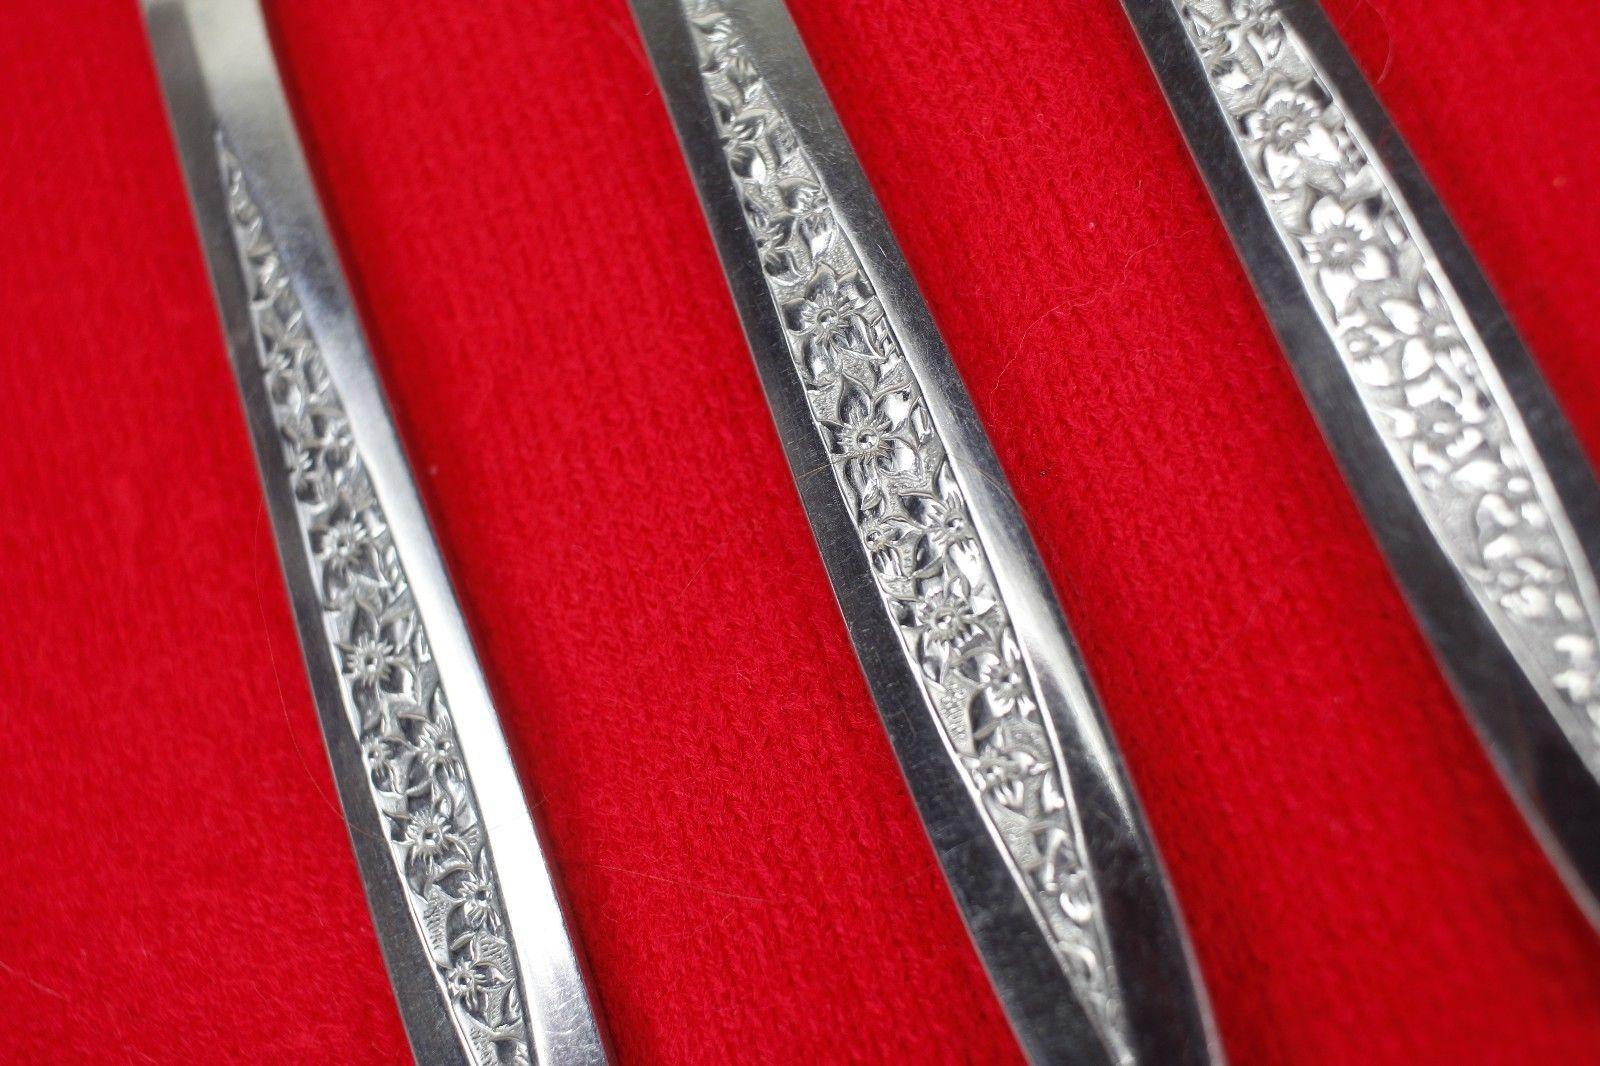 3X Dinner Knives Superior International Silver Petal Lane Stainless Flatware